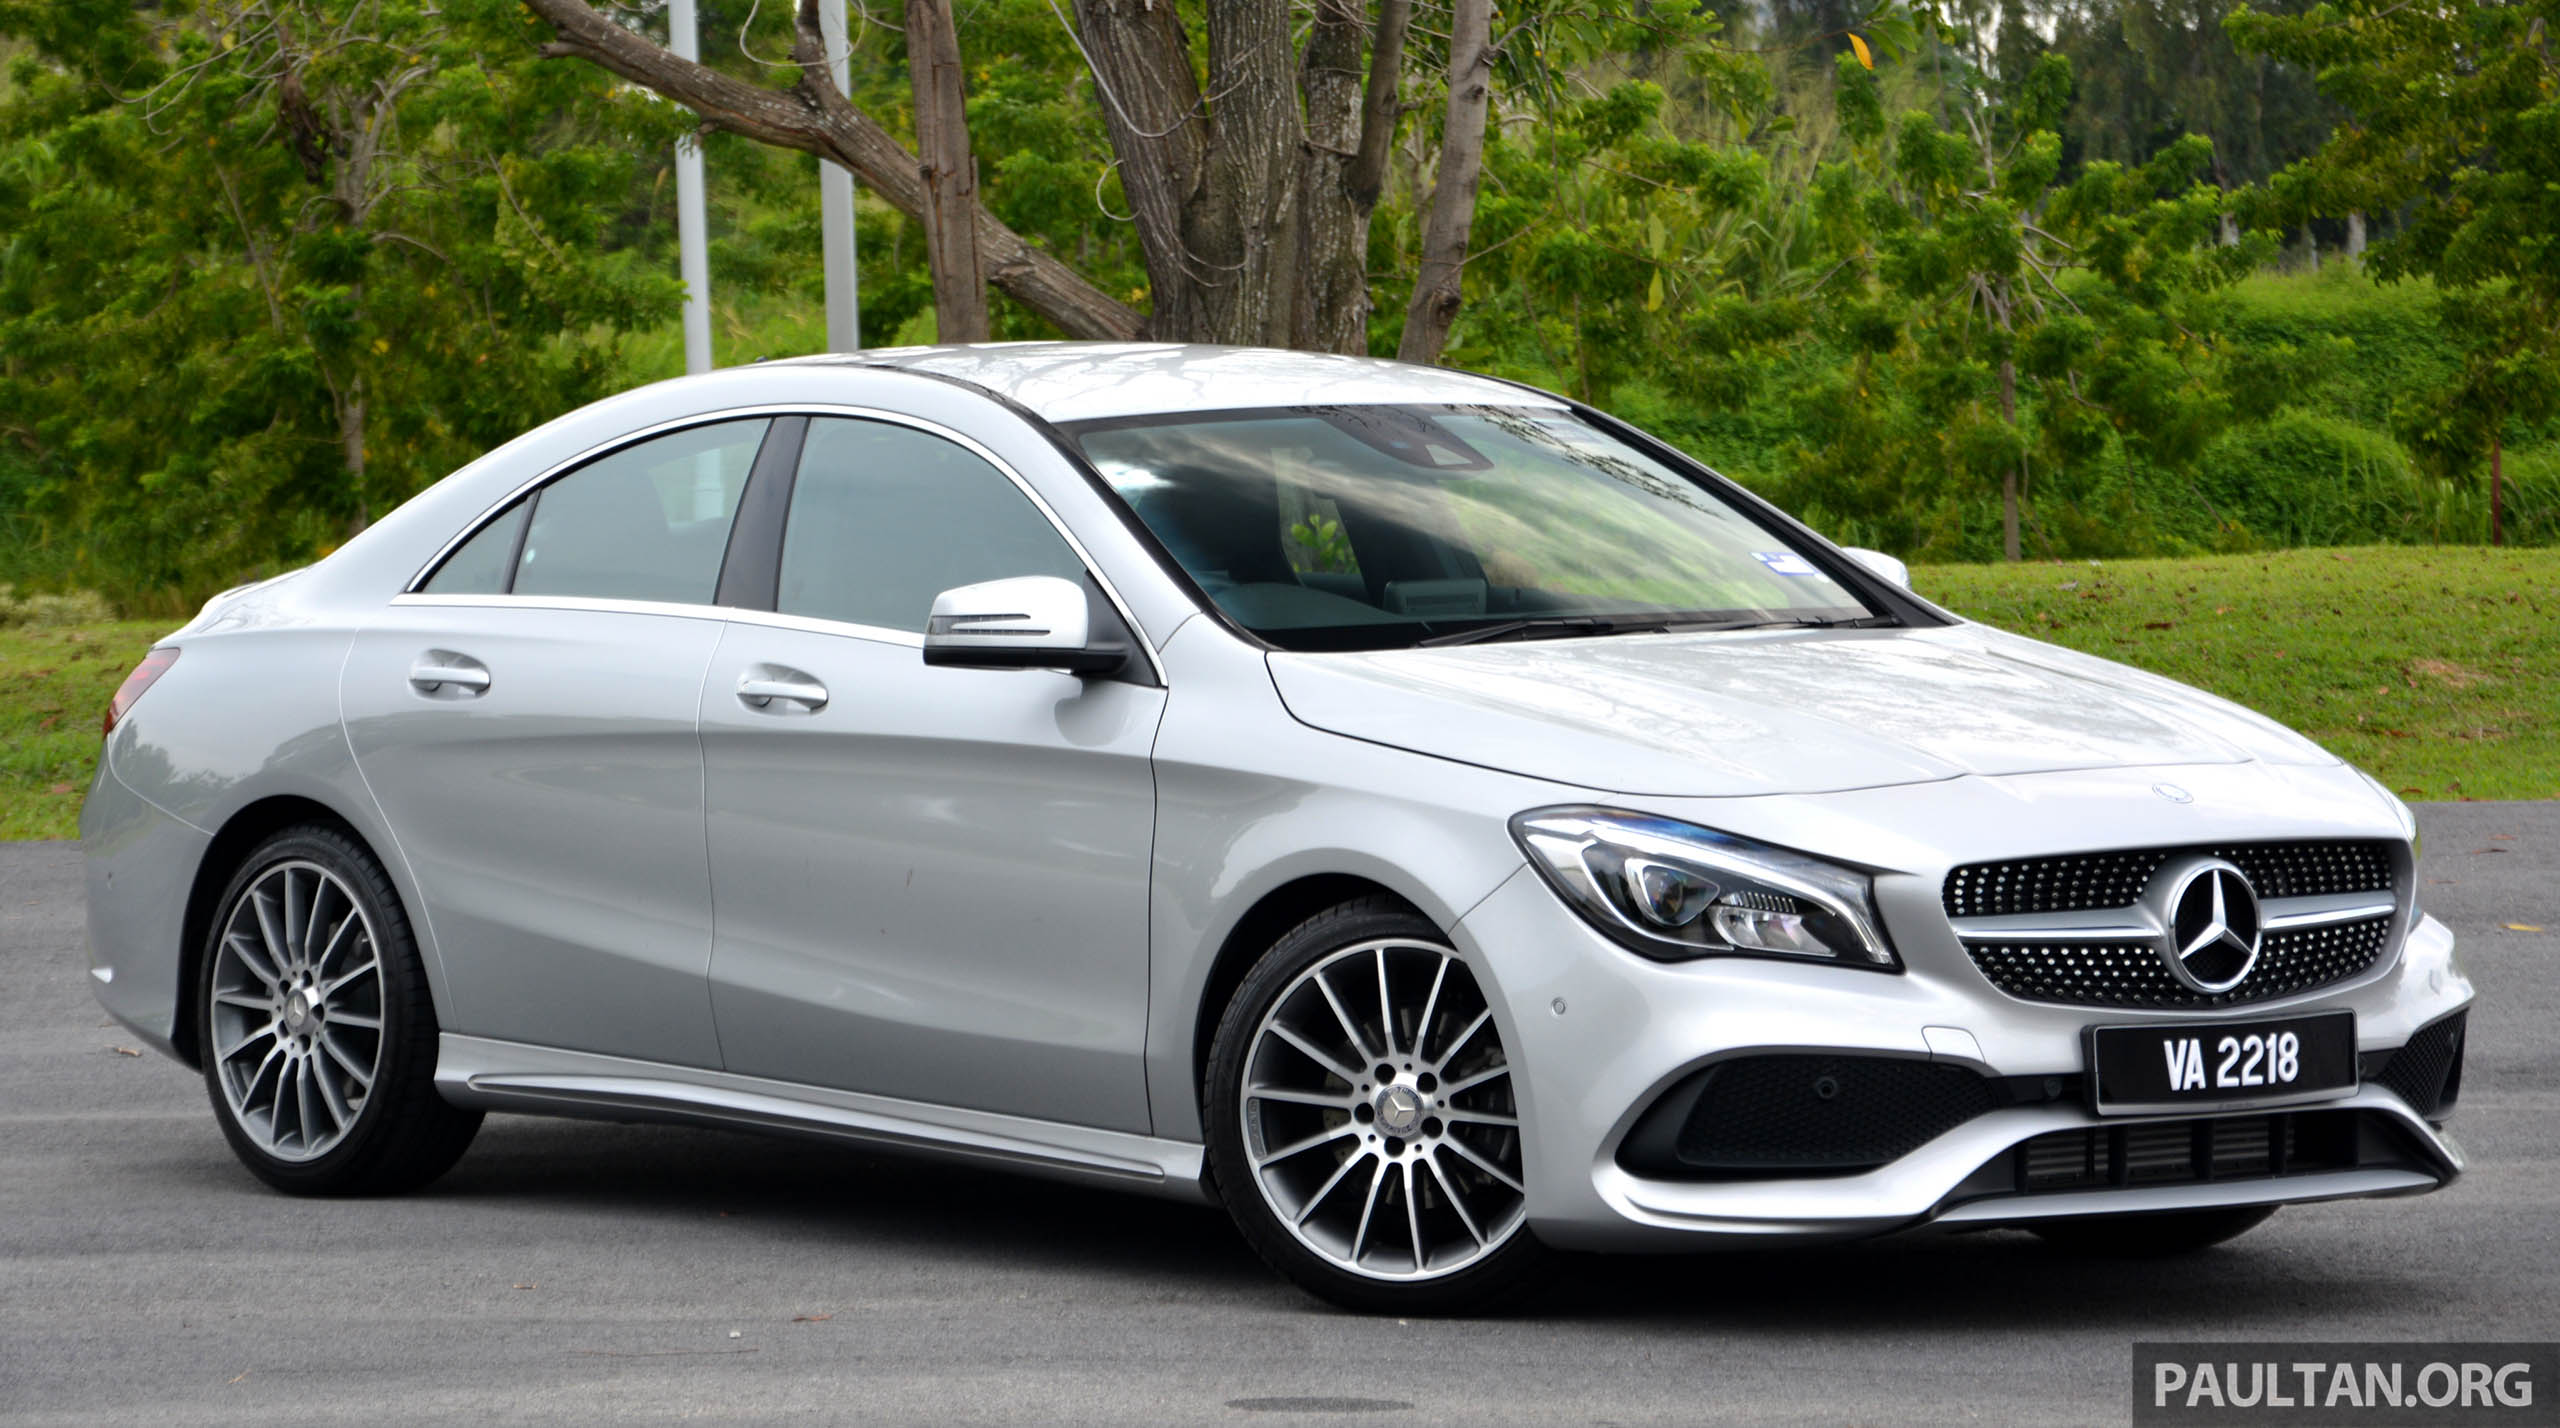 Mercedes benz cla 200 mercedes benz cla 200 for 2017 mercedes benz cla